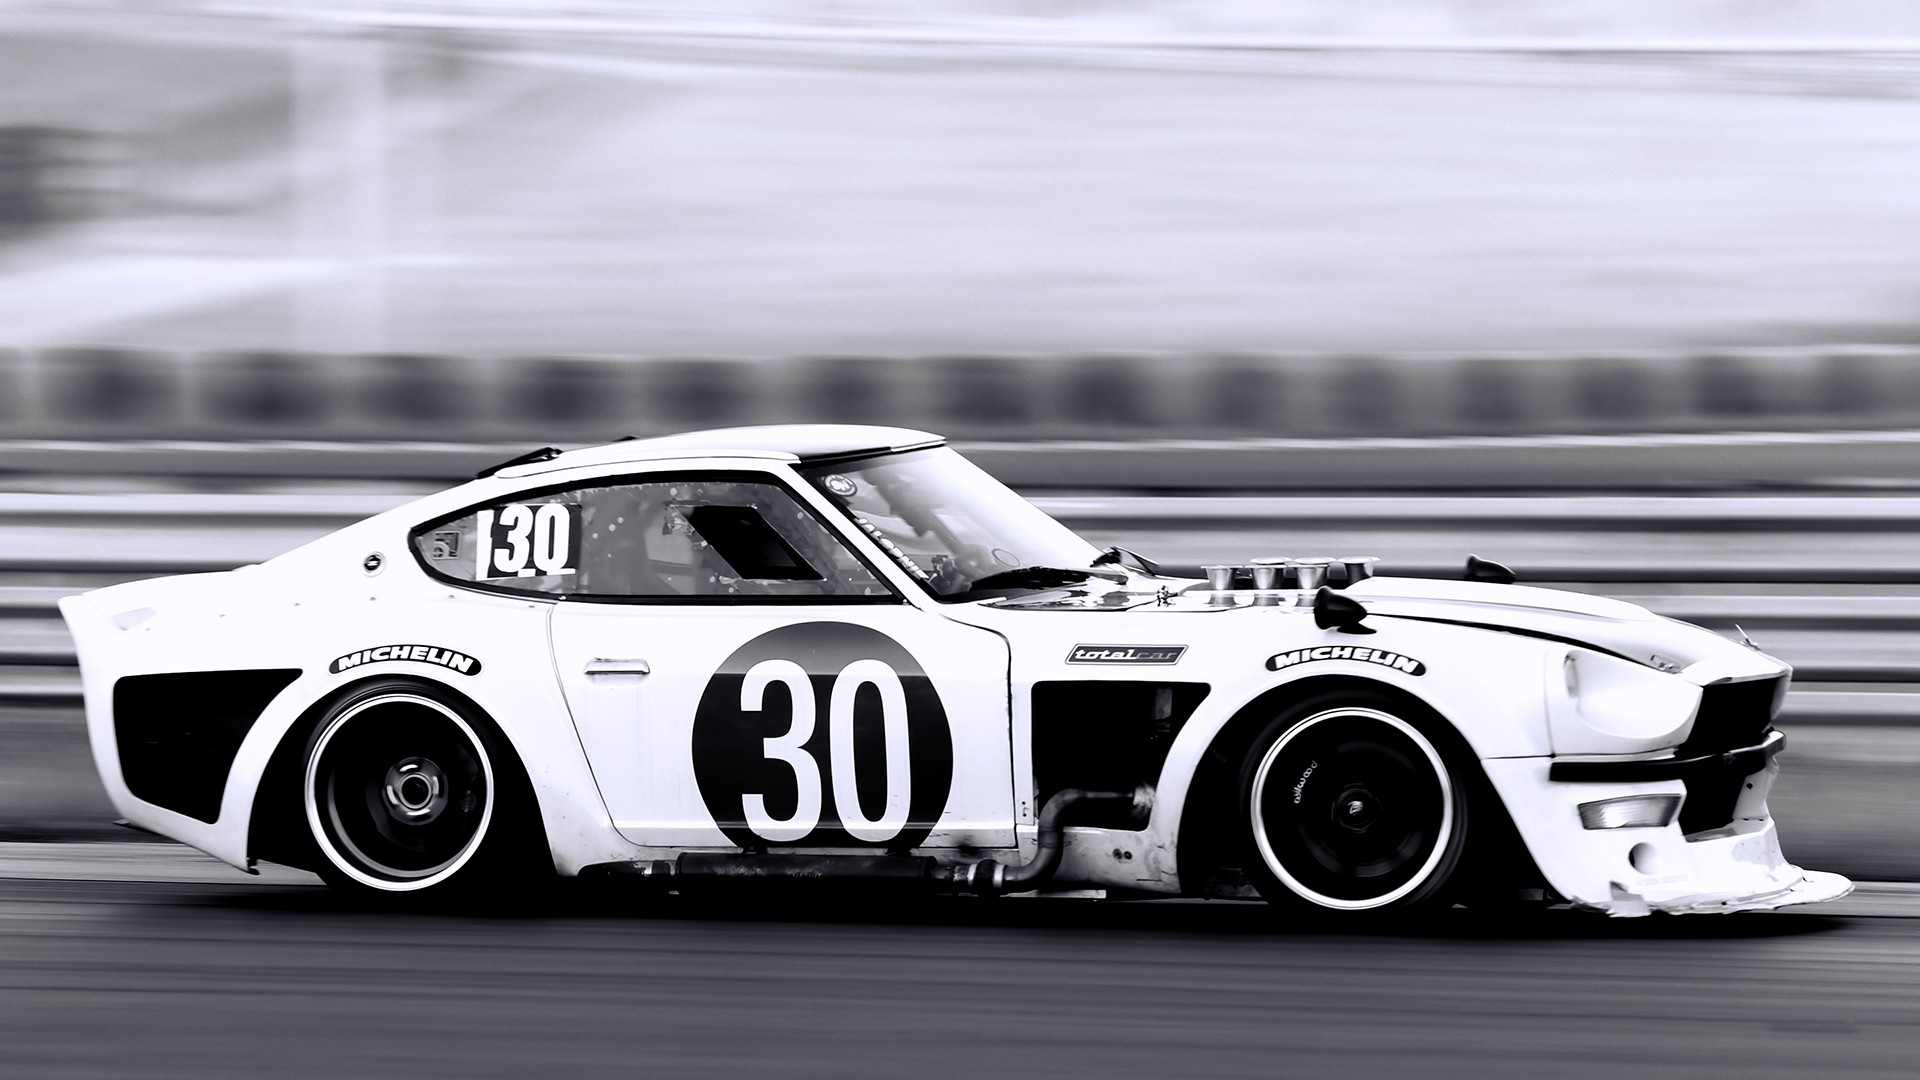 General 1920x1080 car vehicle monochrome race cars Nissan S30 Datsun Nissan